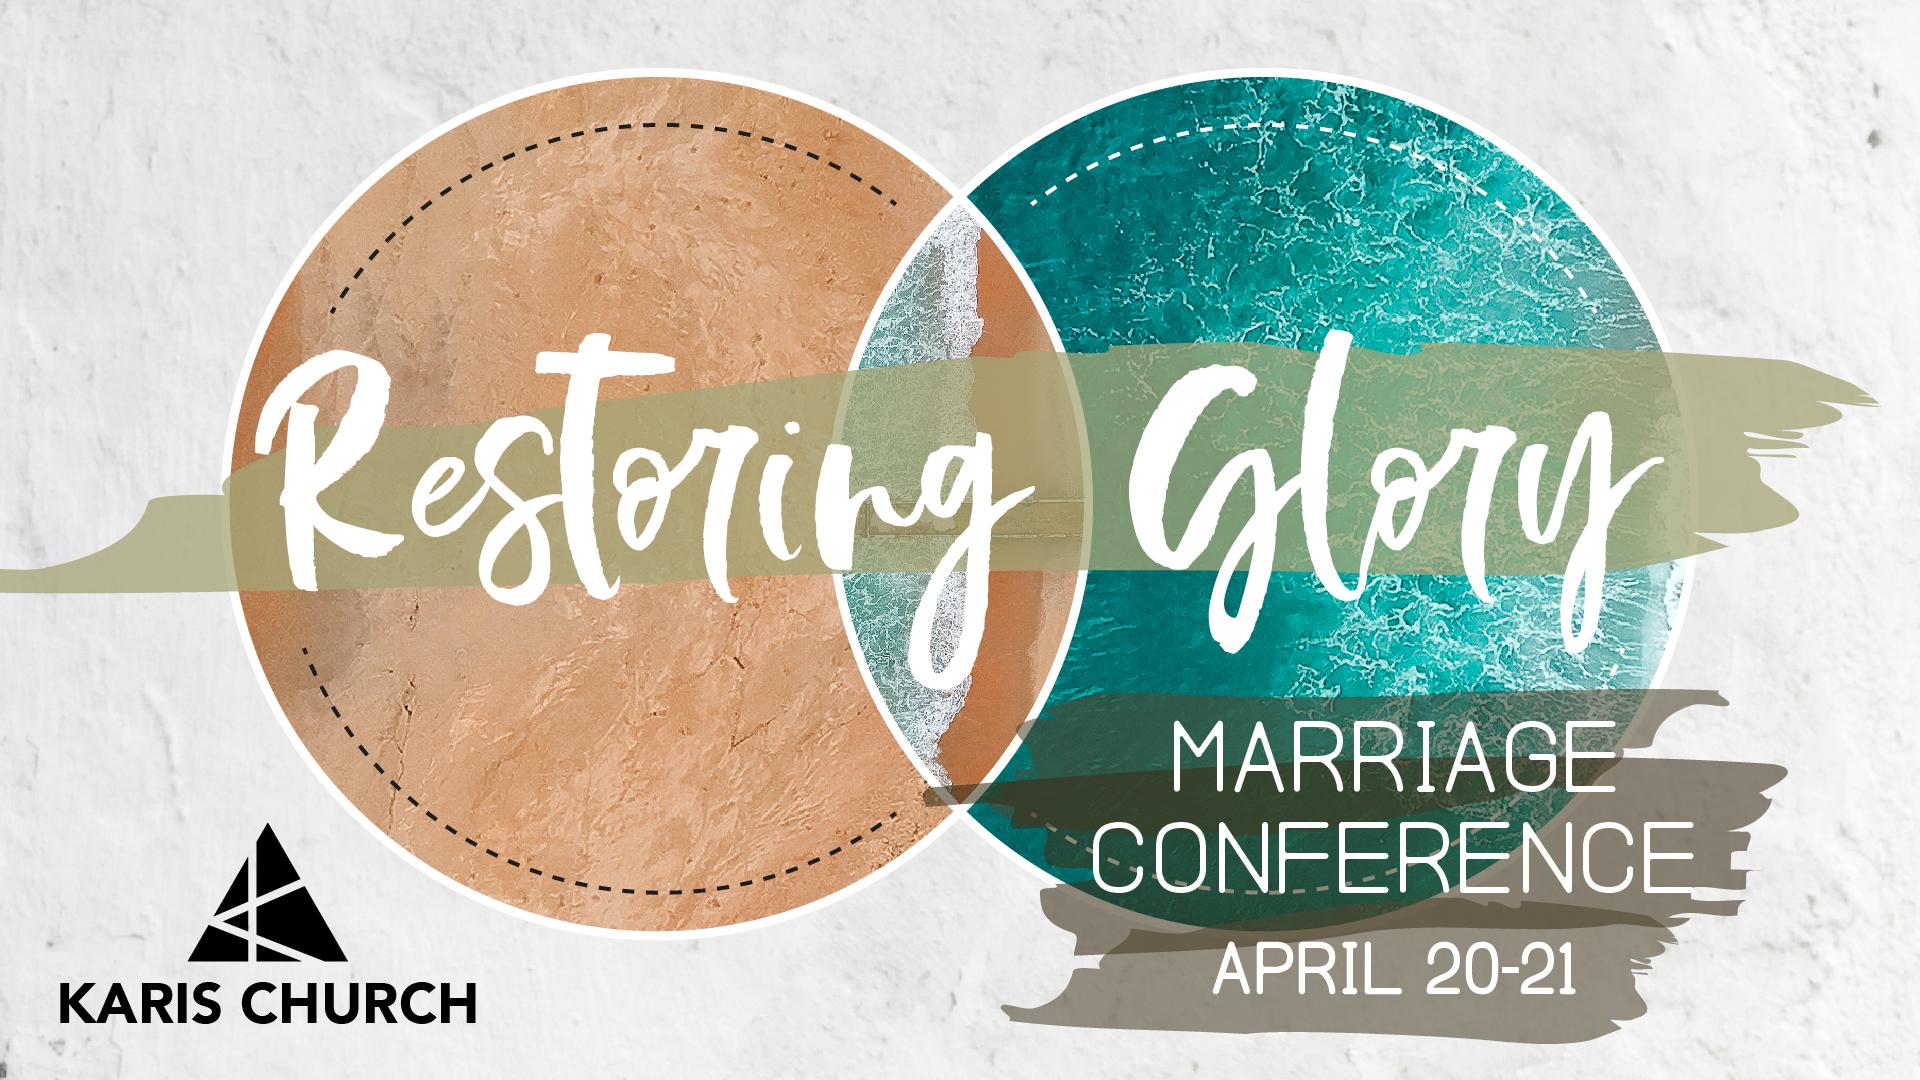 Restoring-Glory-Graphic-01.jpg